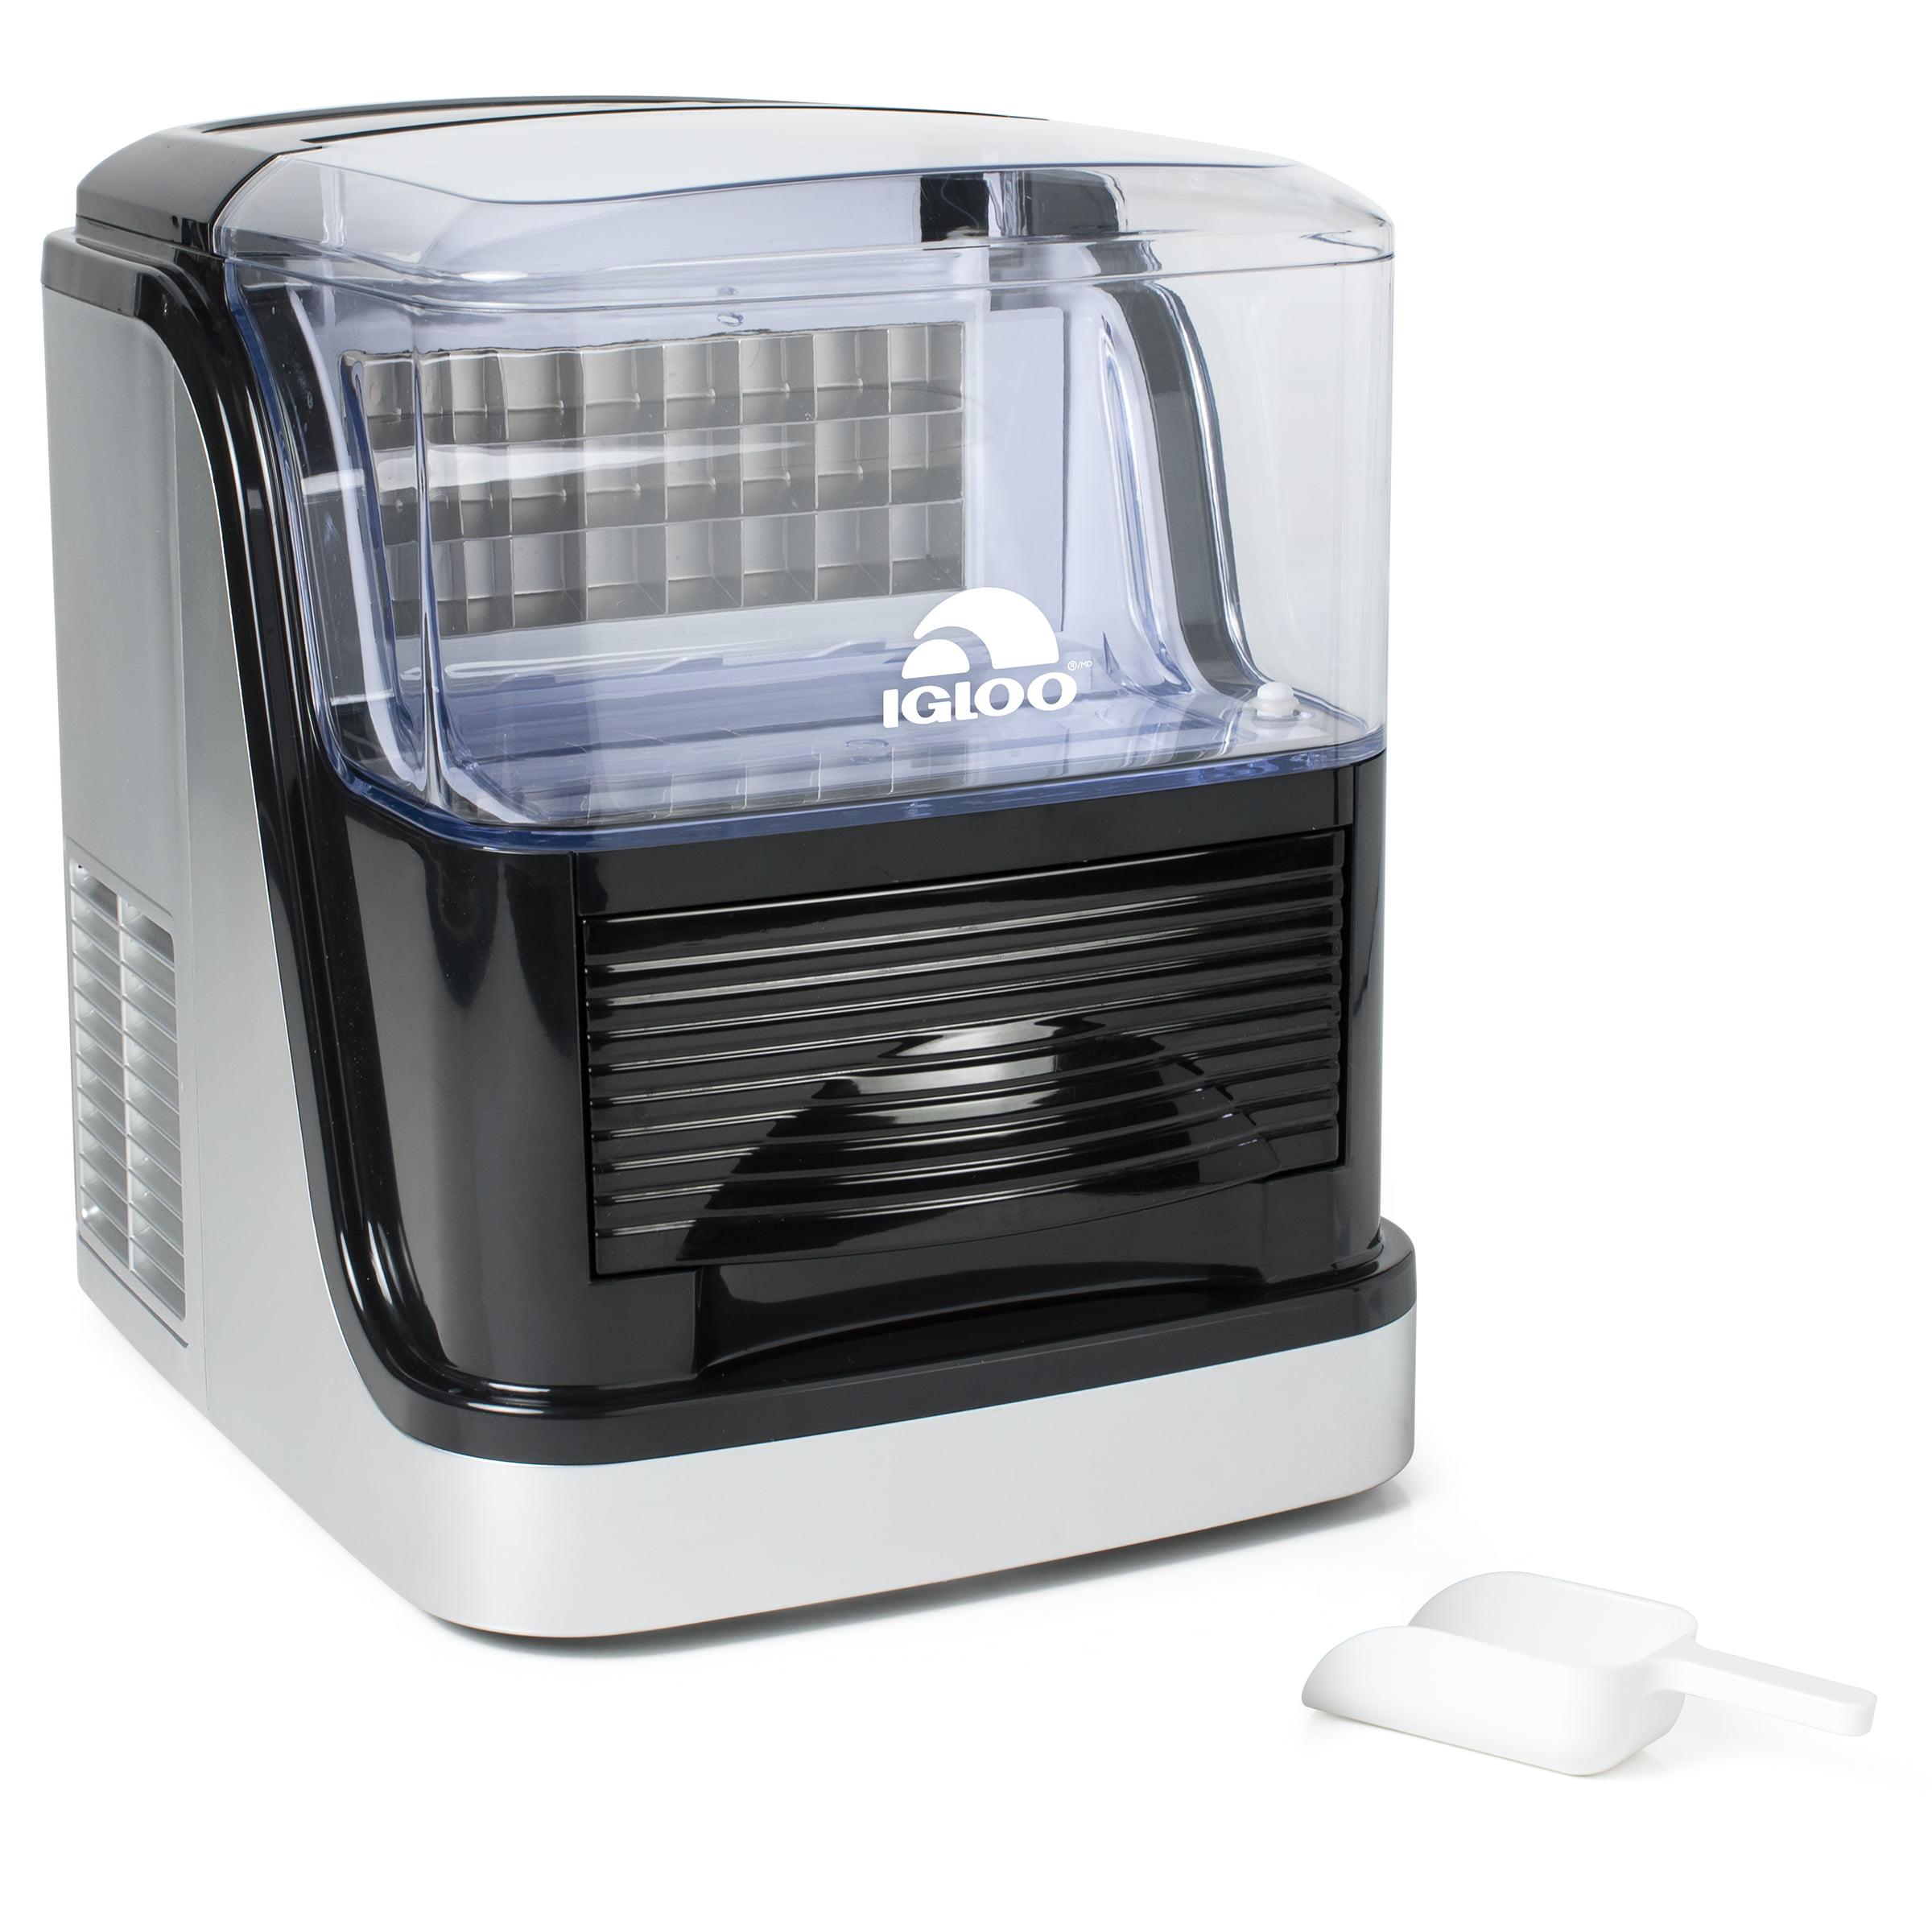 Igloo ICEC33SB Large Capacity Clear Ice Cube Maker